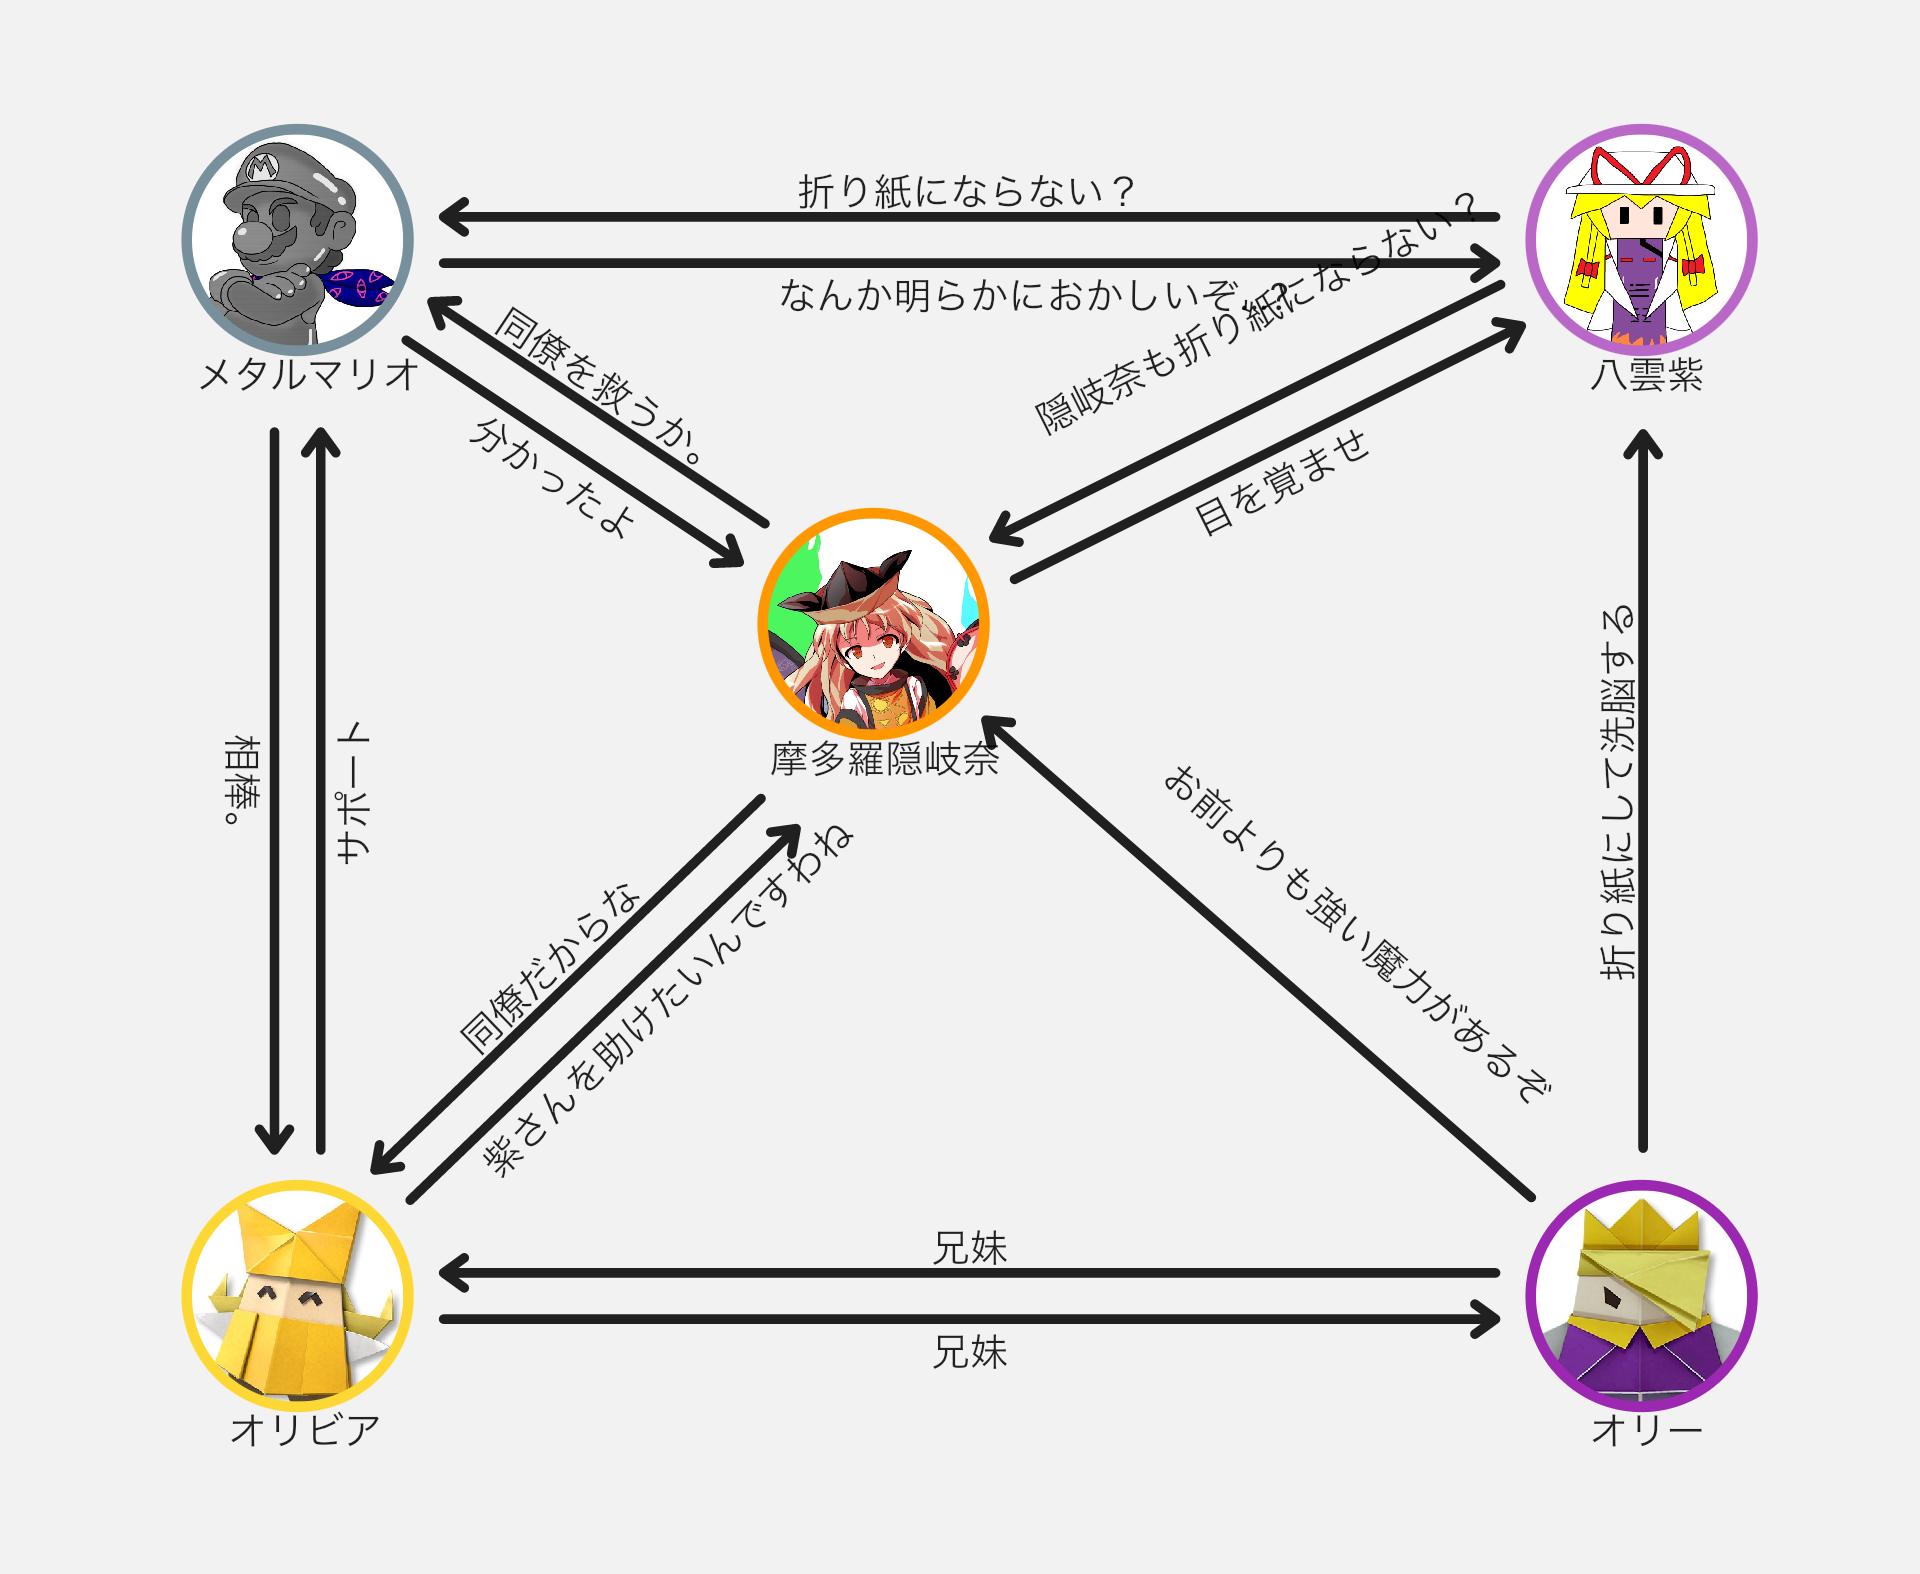 f:id:bandmewtwoyuyuko:20200724192812p:image